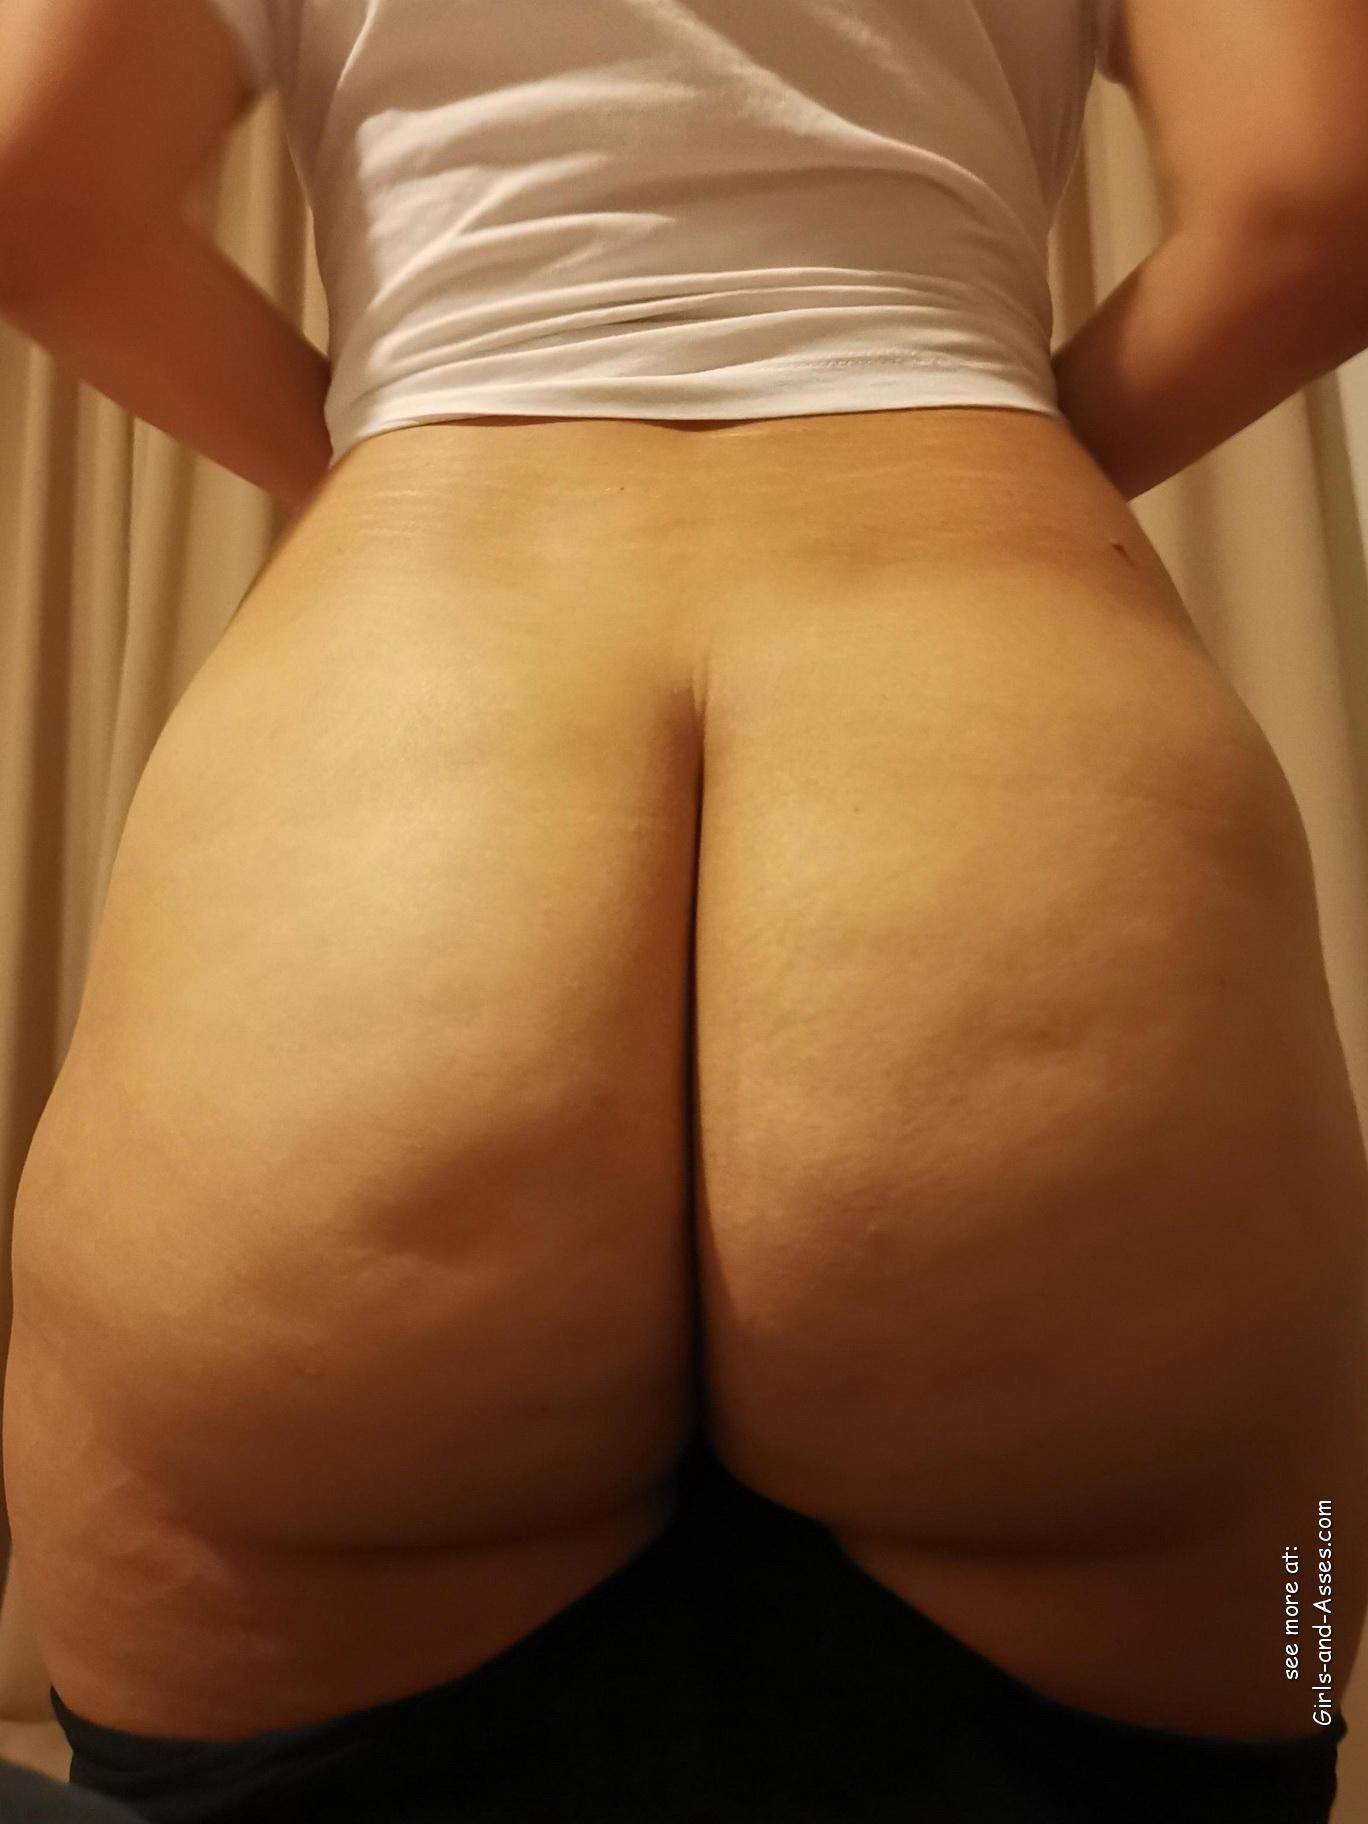 milf pawg booty photo 00228